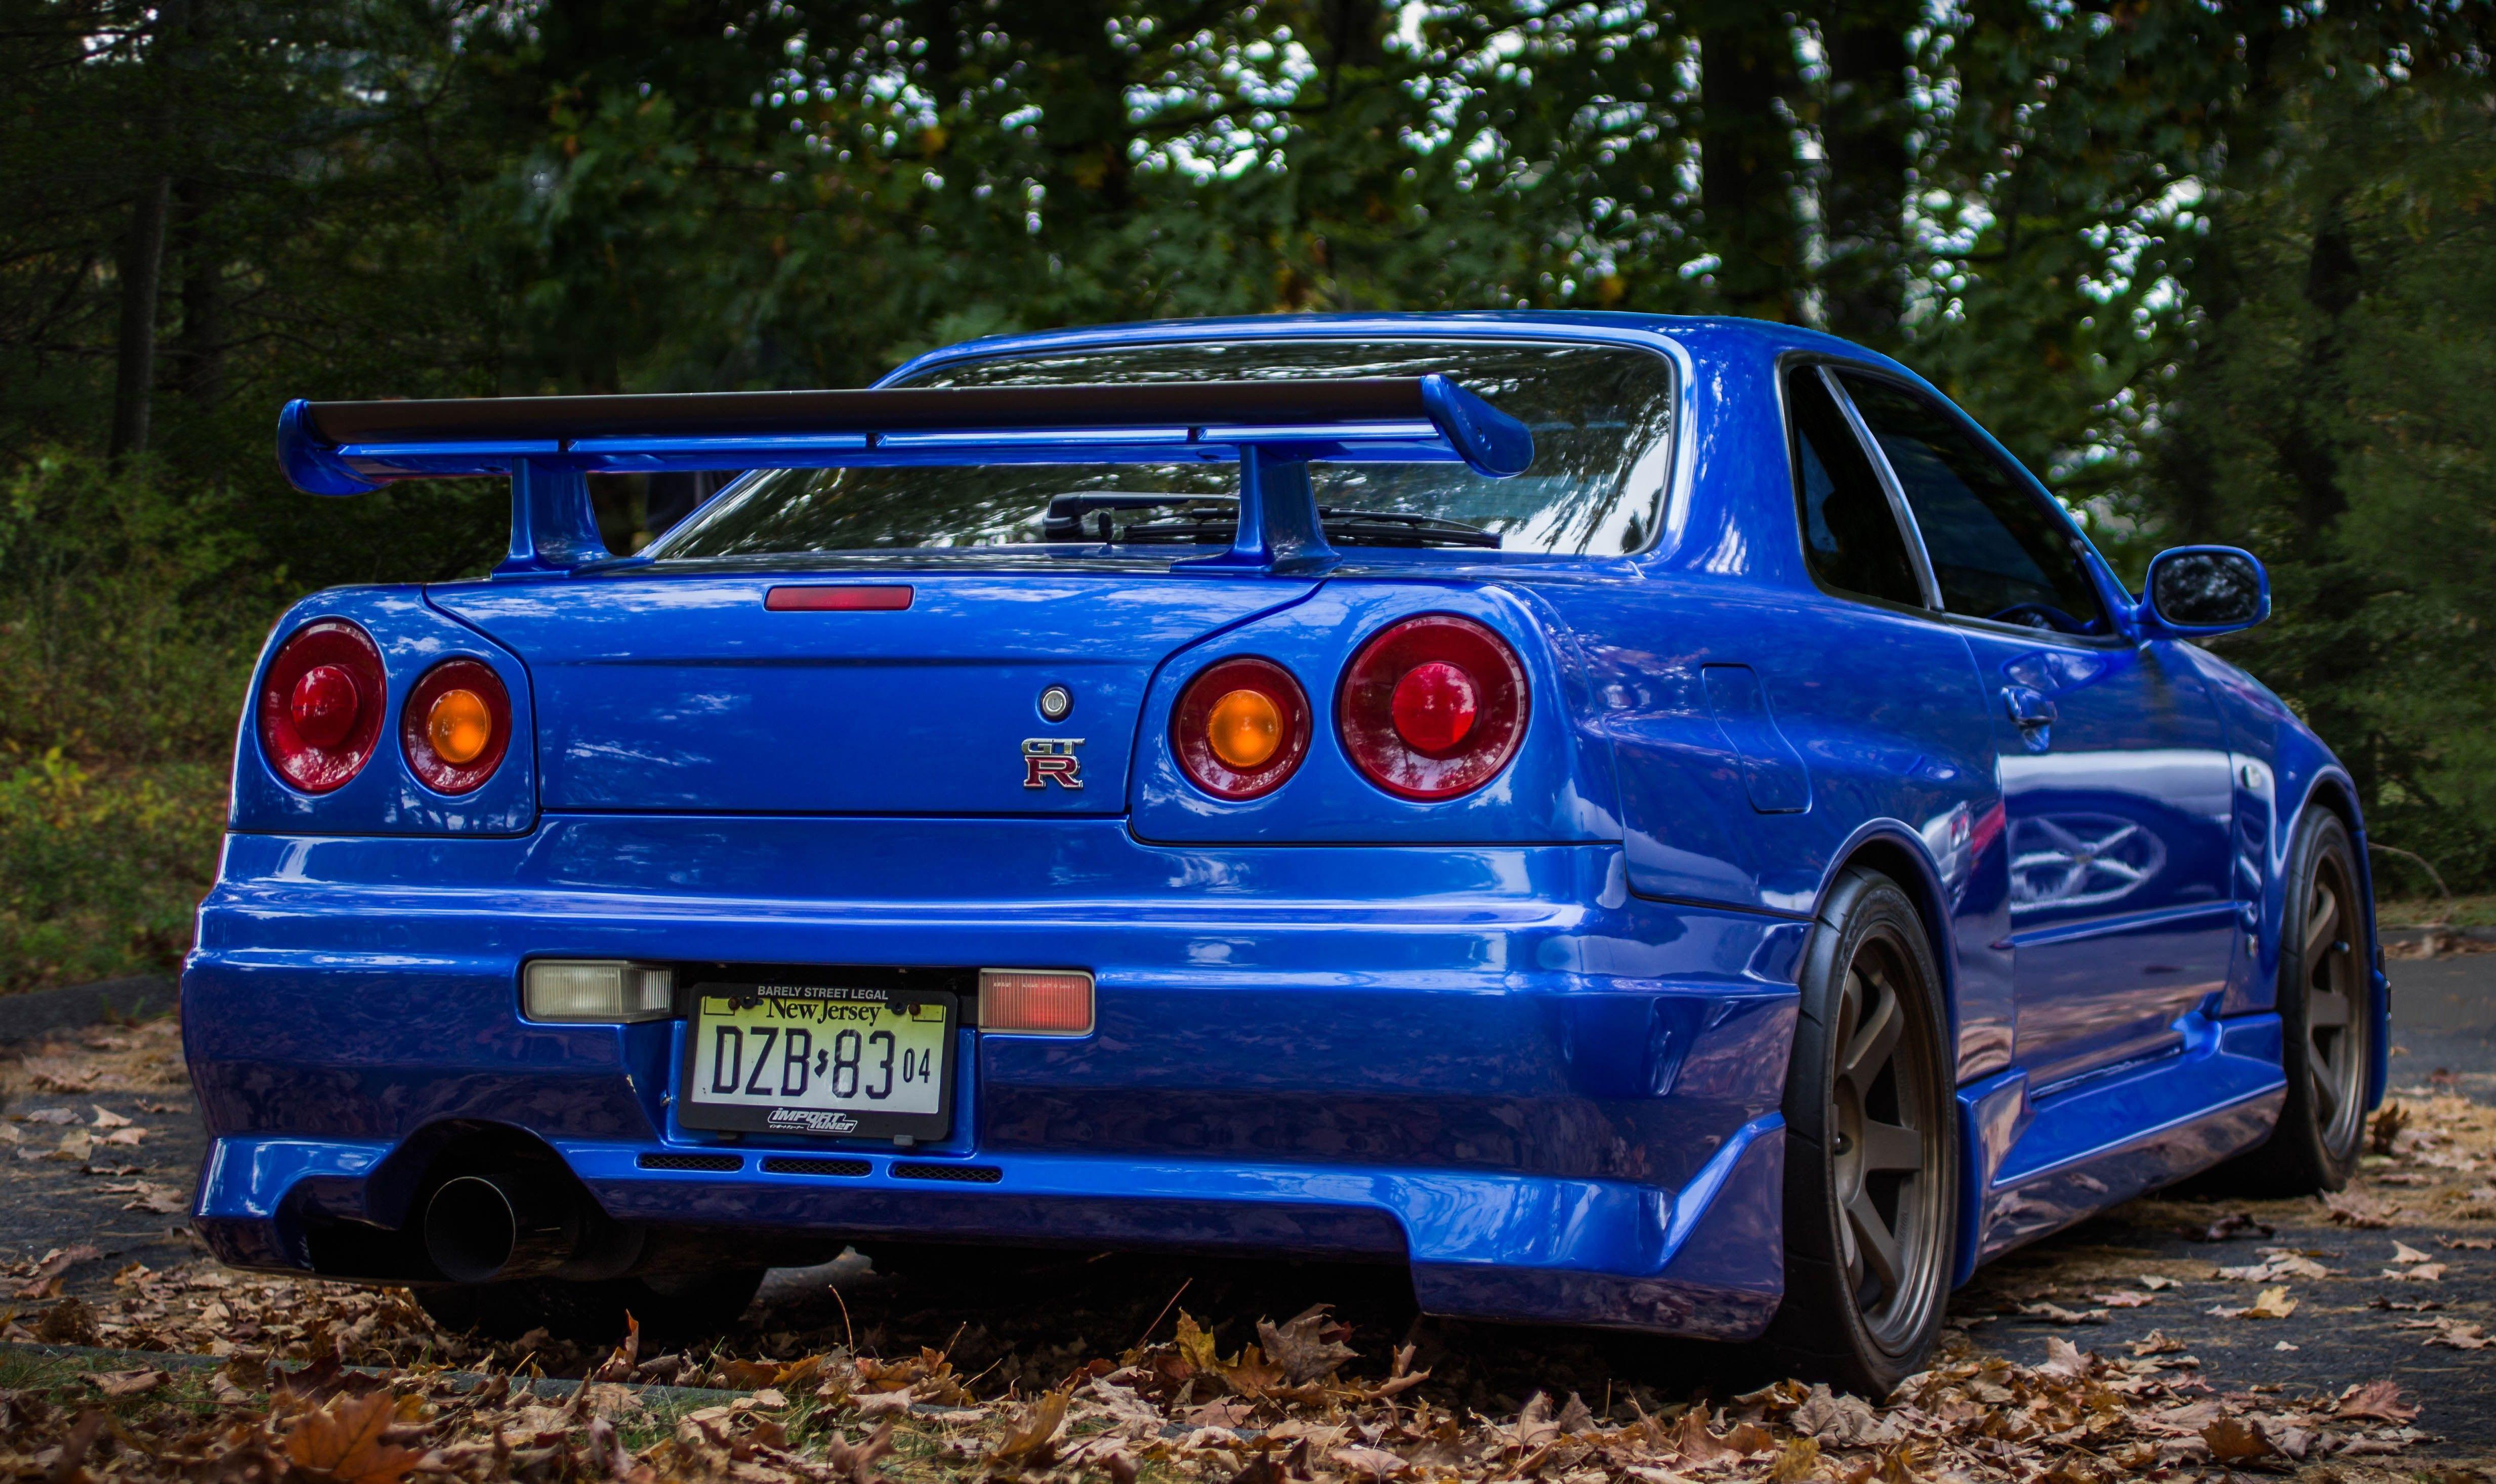 2 Nissan Skyline GT-R R34 HD Wallpapers | Backgrounds - Wallpaper ...